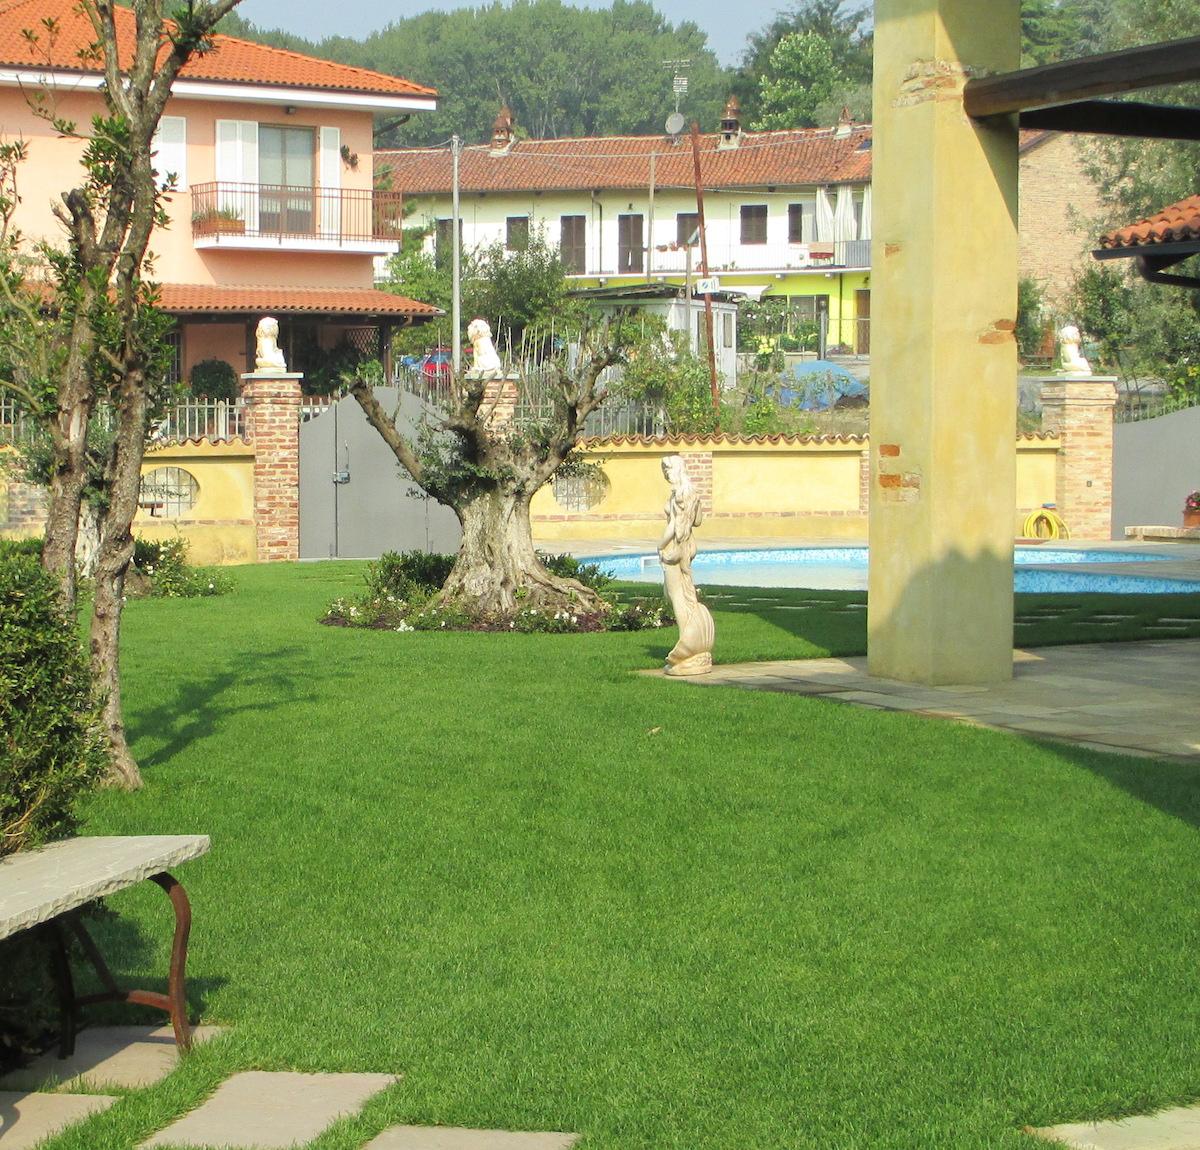 Manutenzione giardini in Cuneo e provincia  Grandacasa